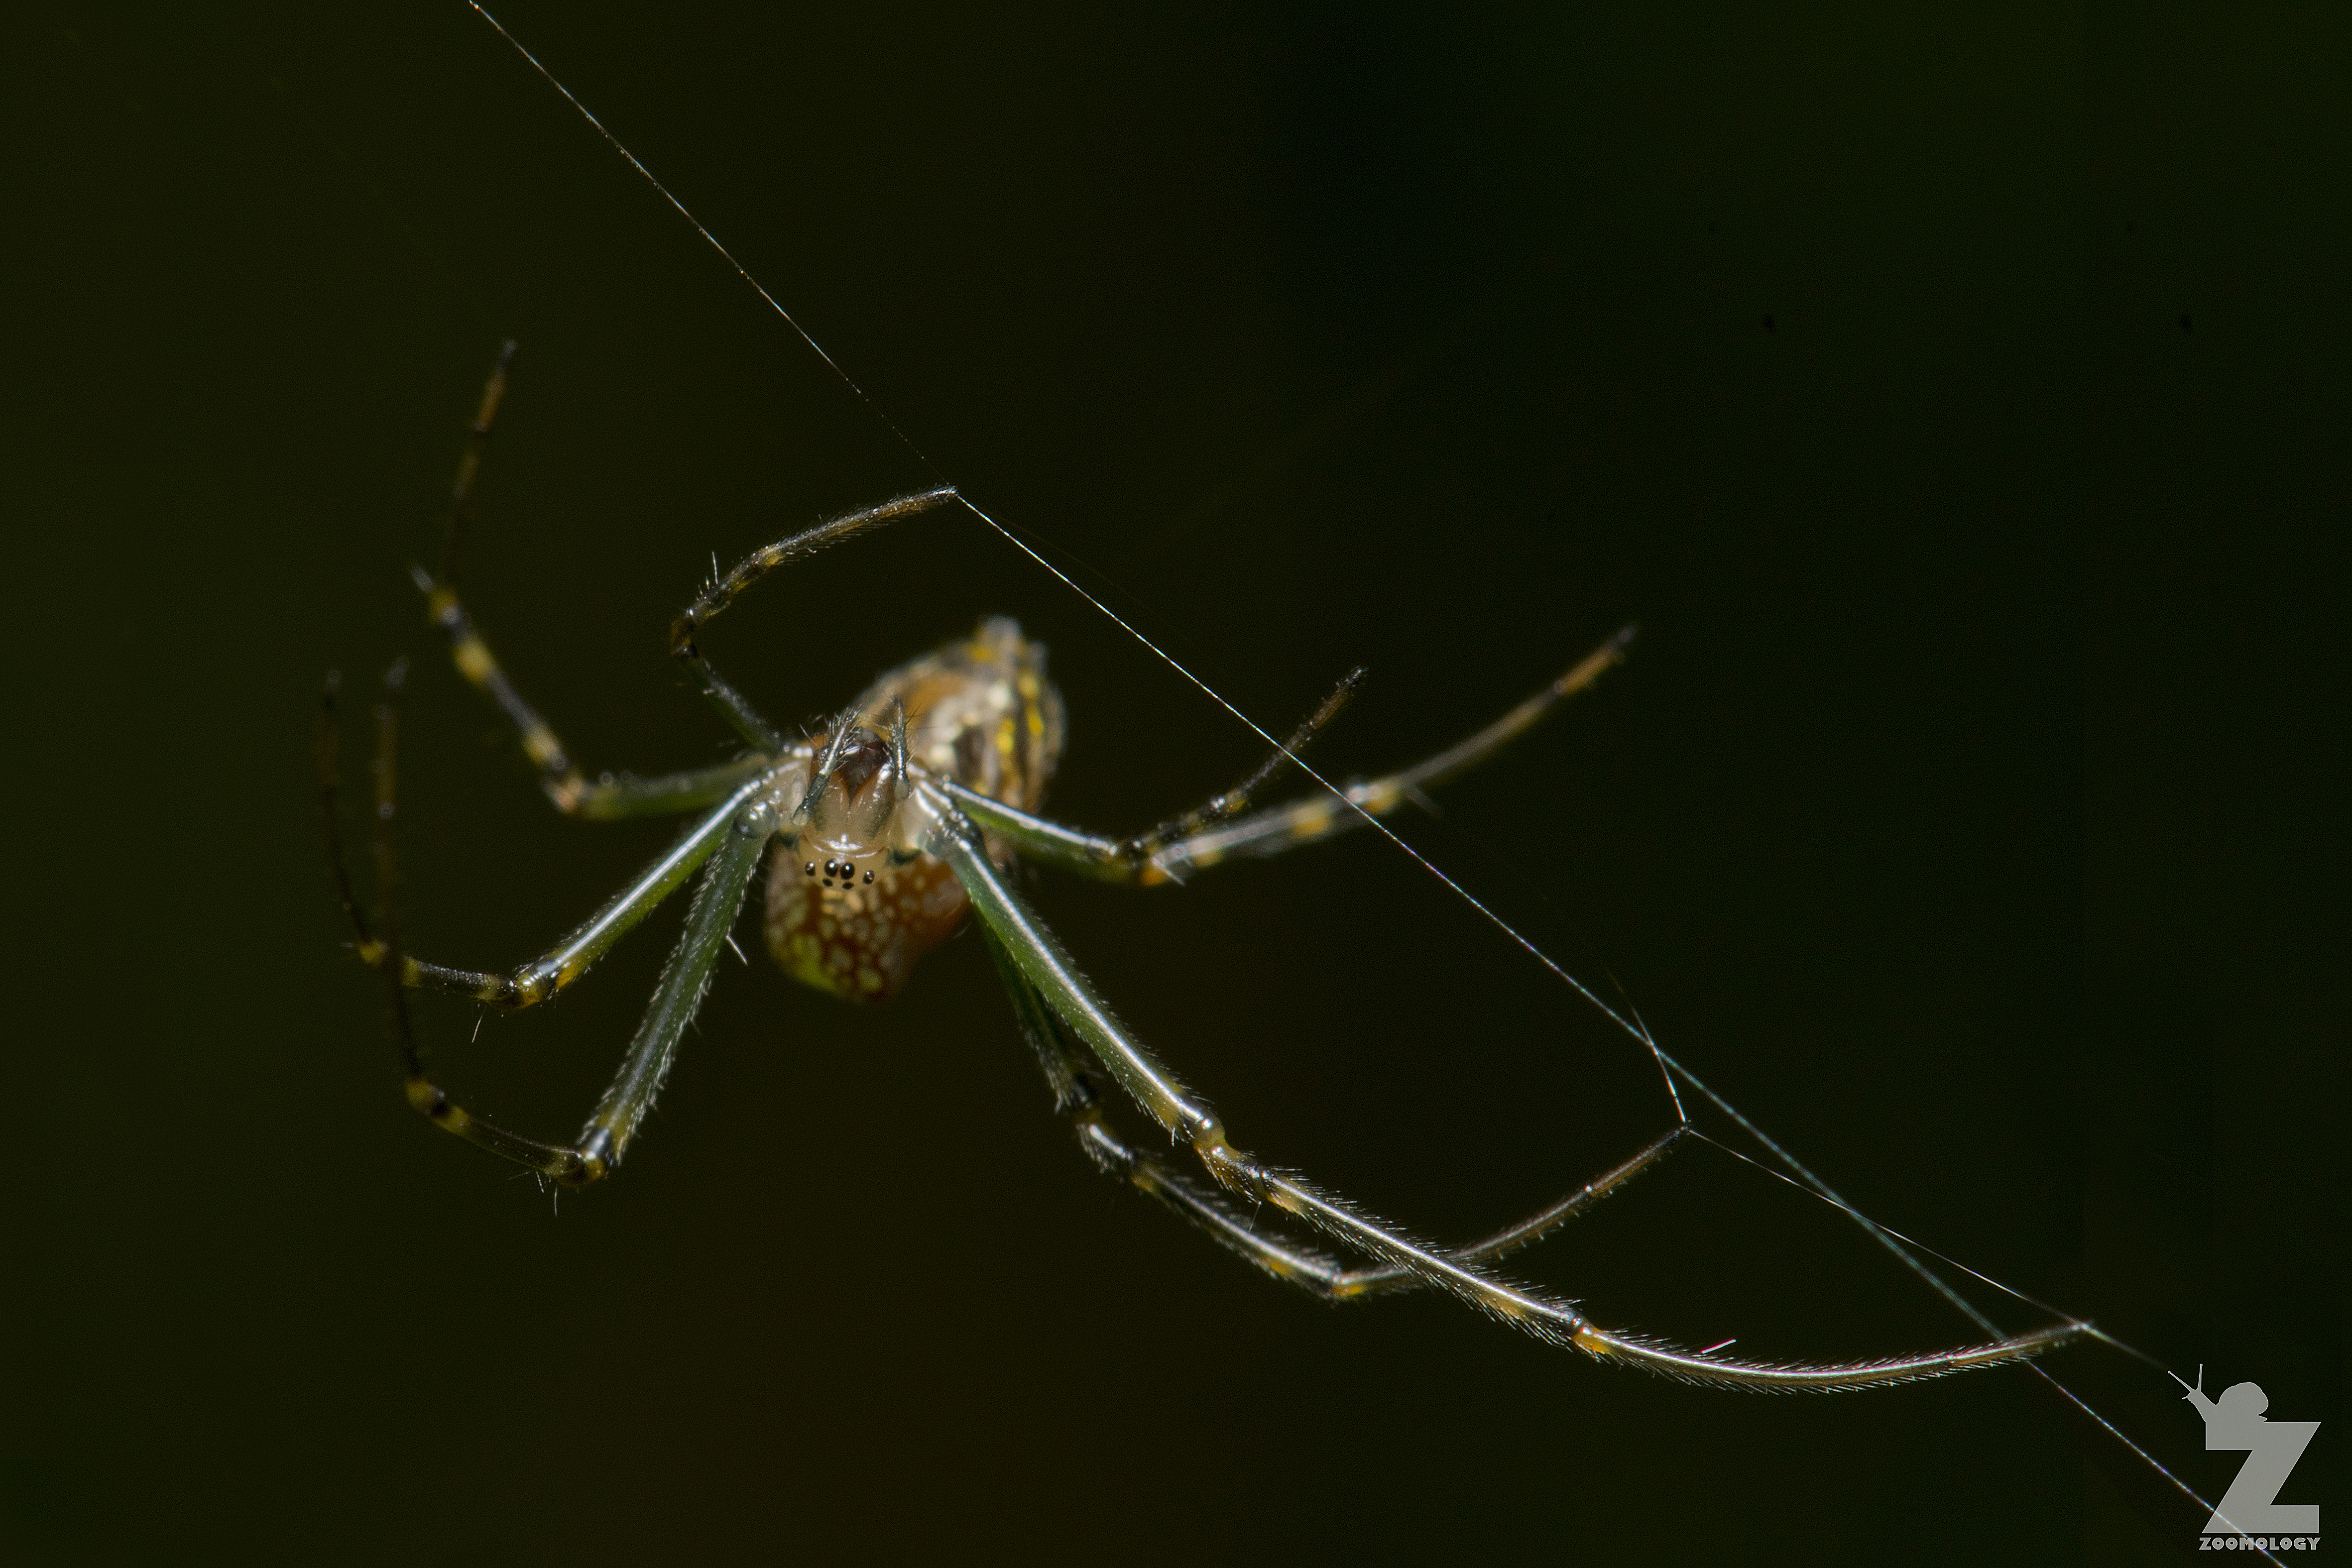 The Silver Orb Spider Leucauge Dromedaria Zoomology Blog